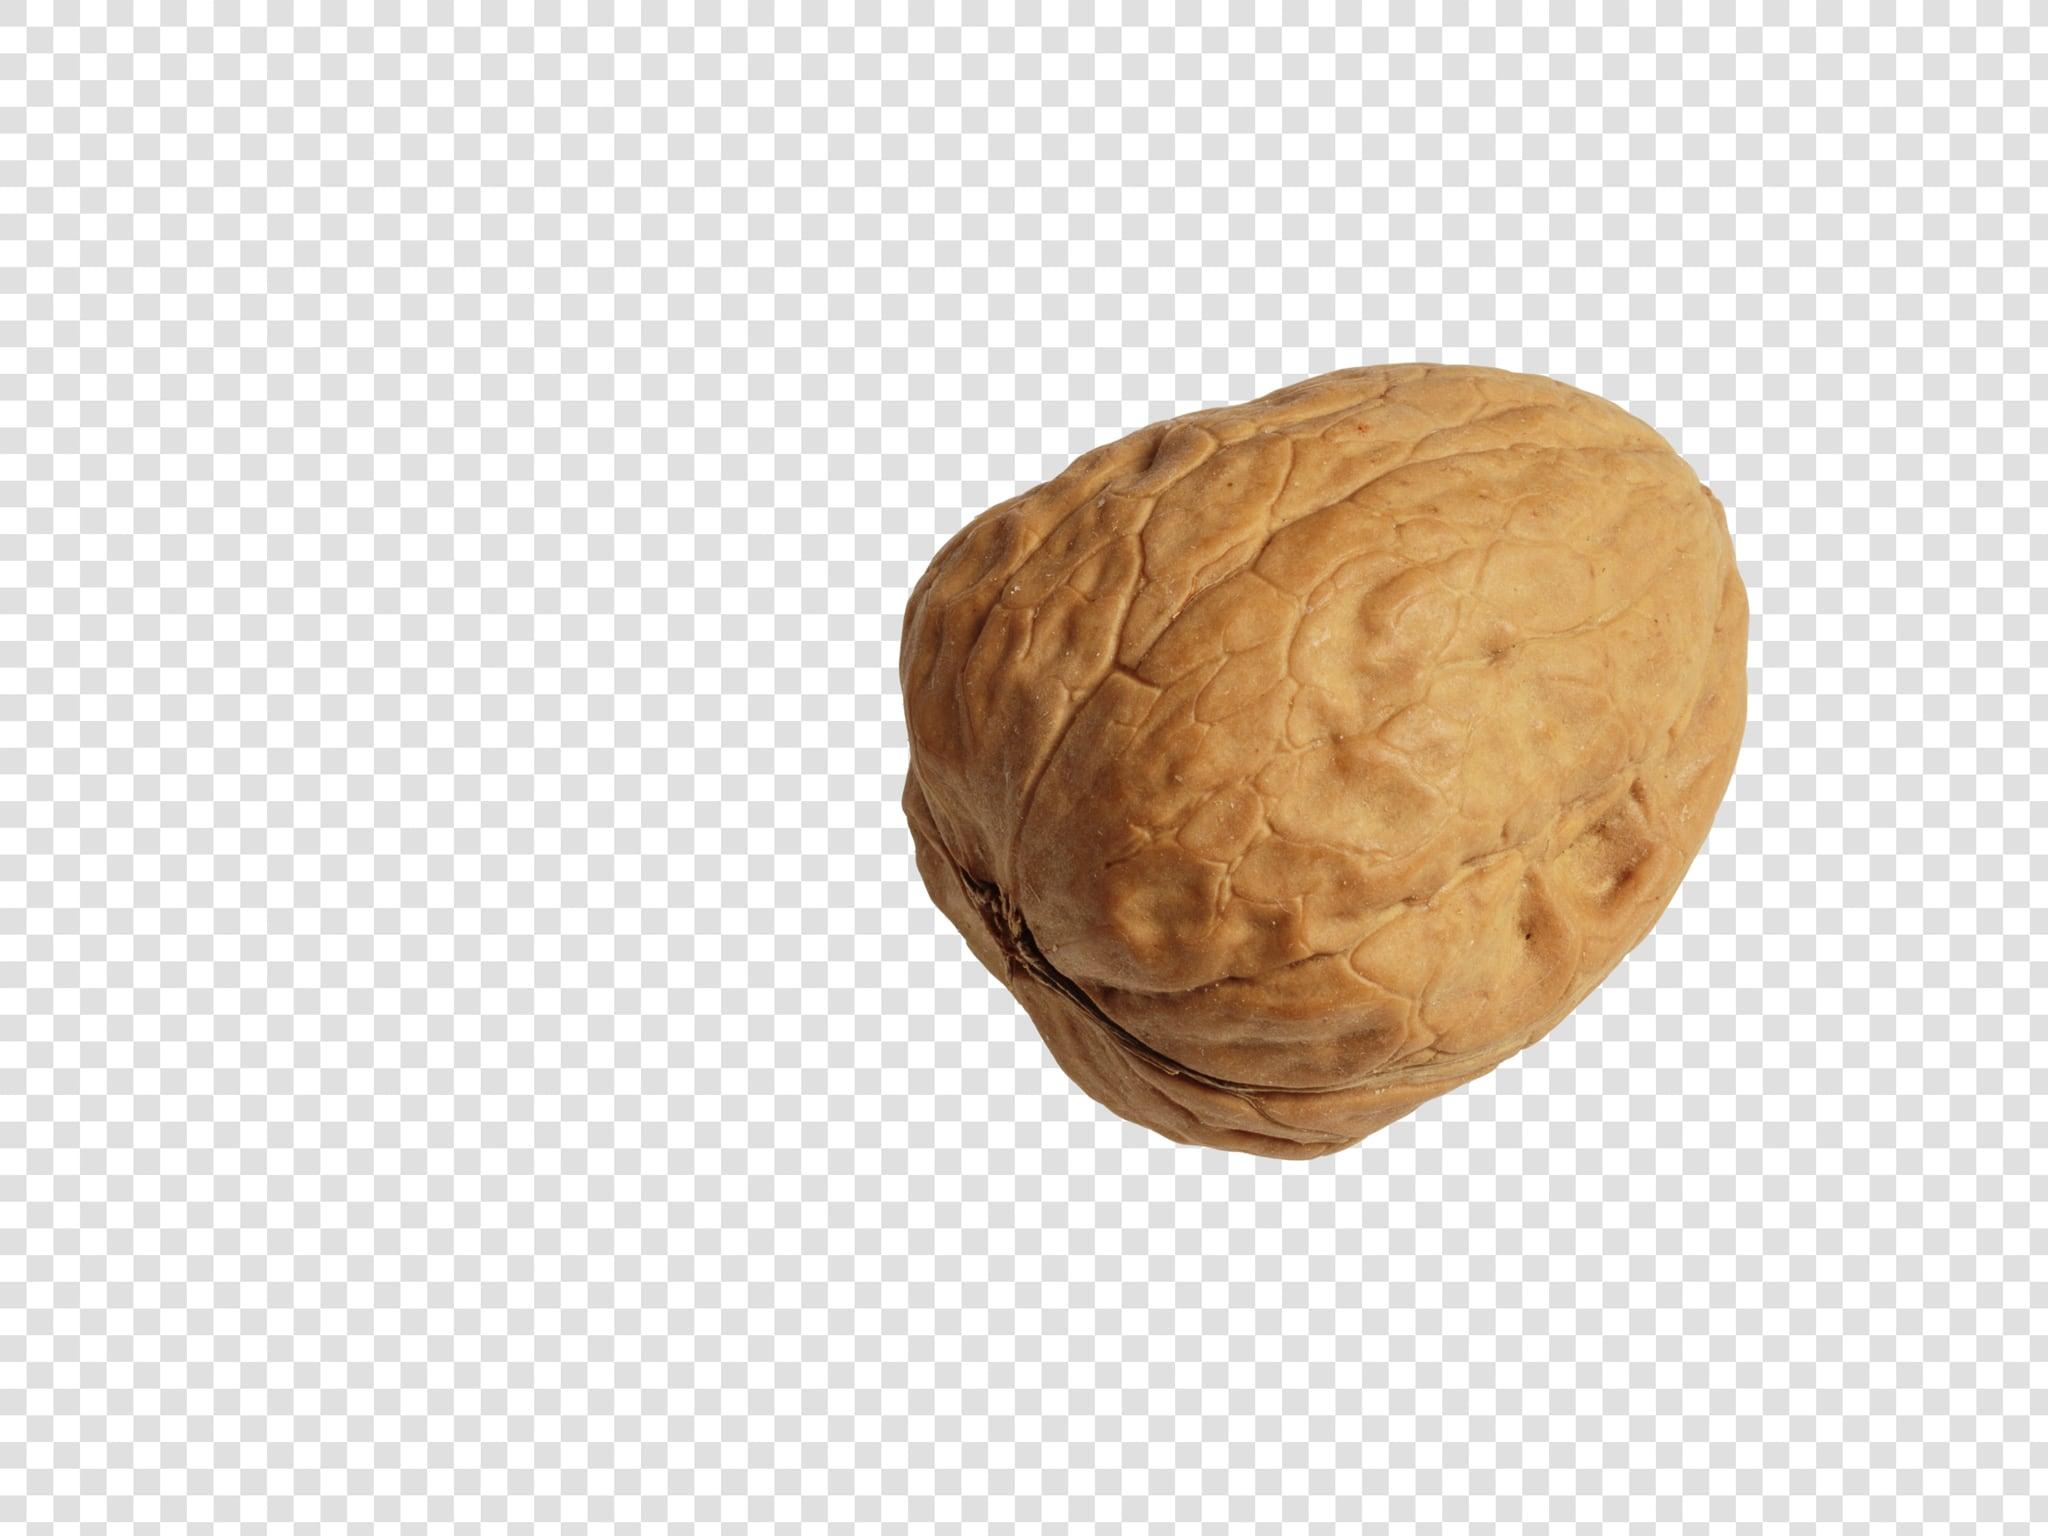 Walnut image asset with transparent background